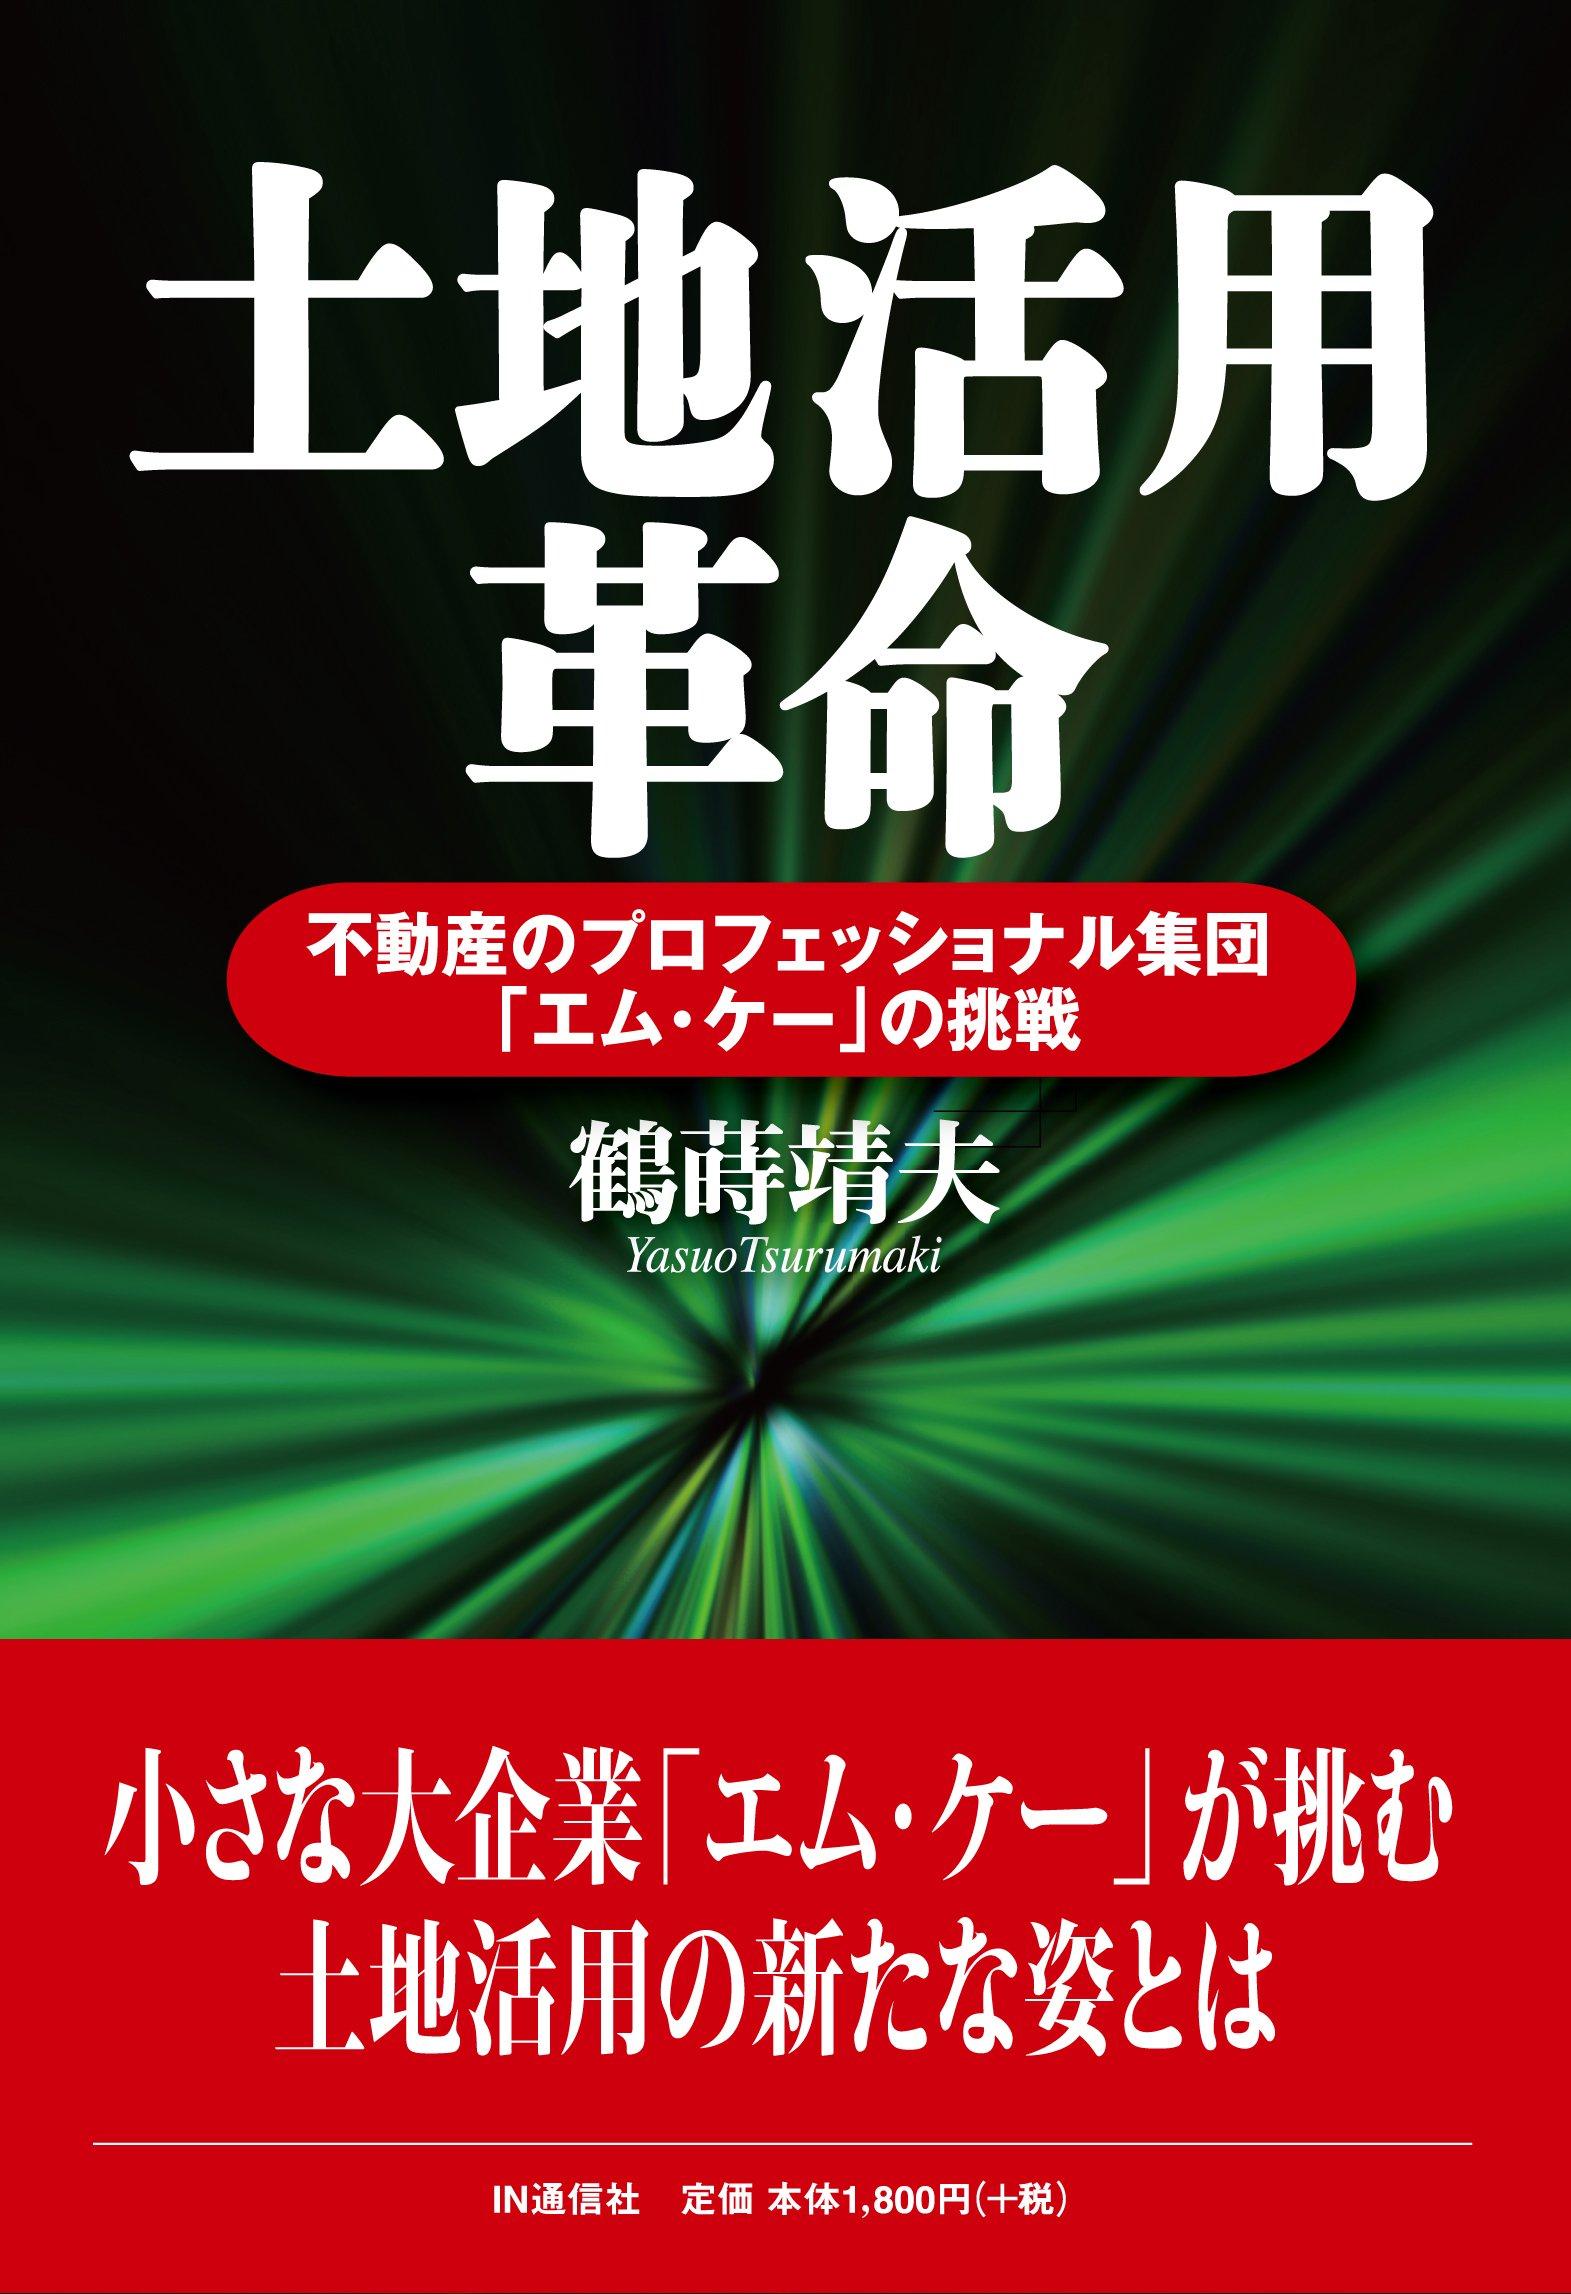 Tochi Katsuyou Kaumei: Fudousan no Professional Shuudan MK no Chousen (Japanese Edition)